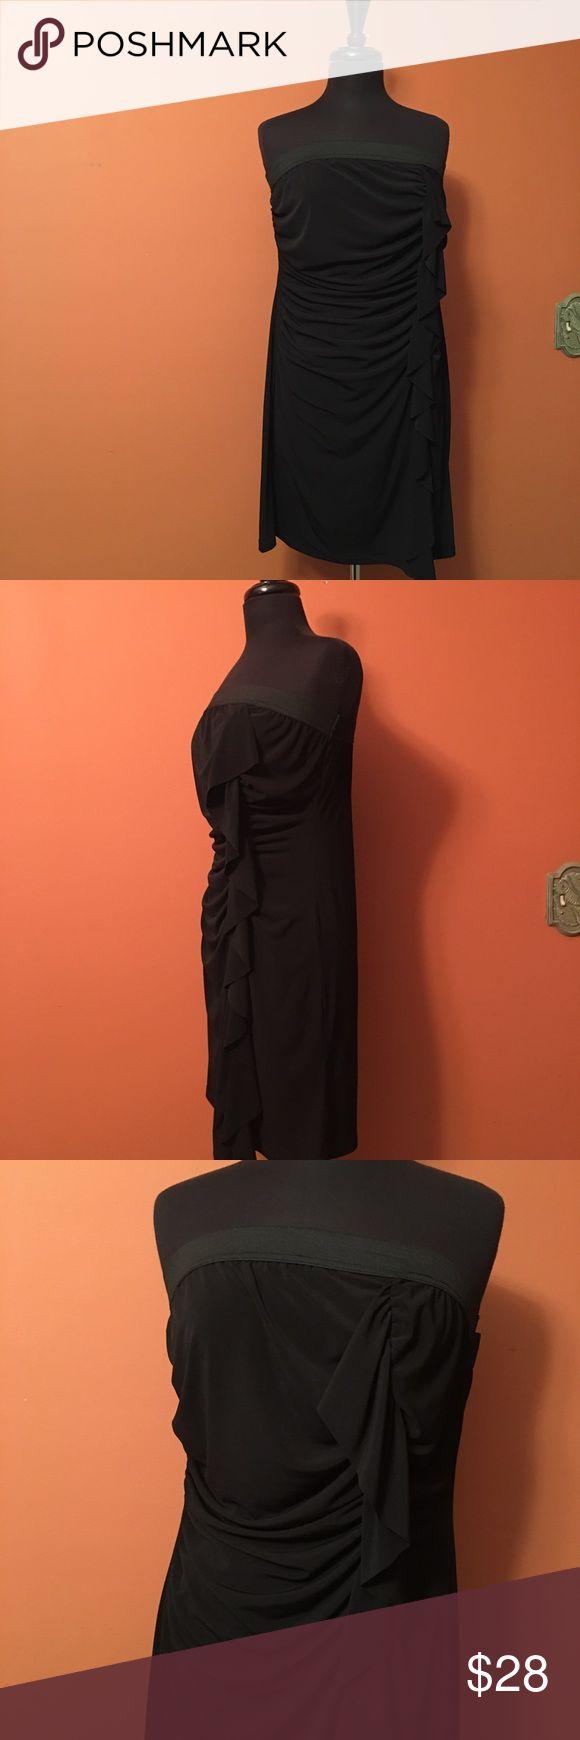 Strapless Ruched Little Black Dress Plus size strapless Ruched front dress size 2X, NWT, polyester/spandex L8ter Dresses Mini